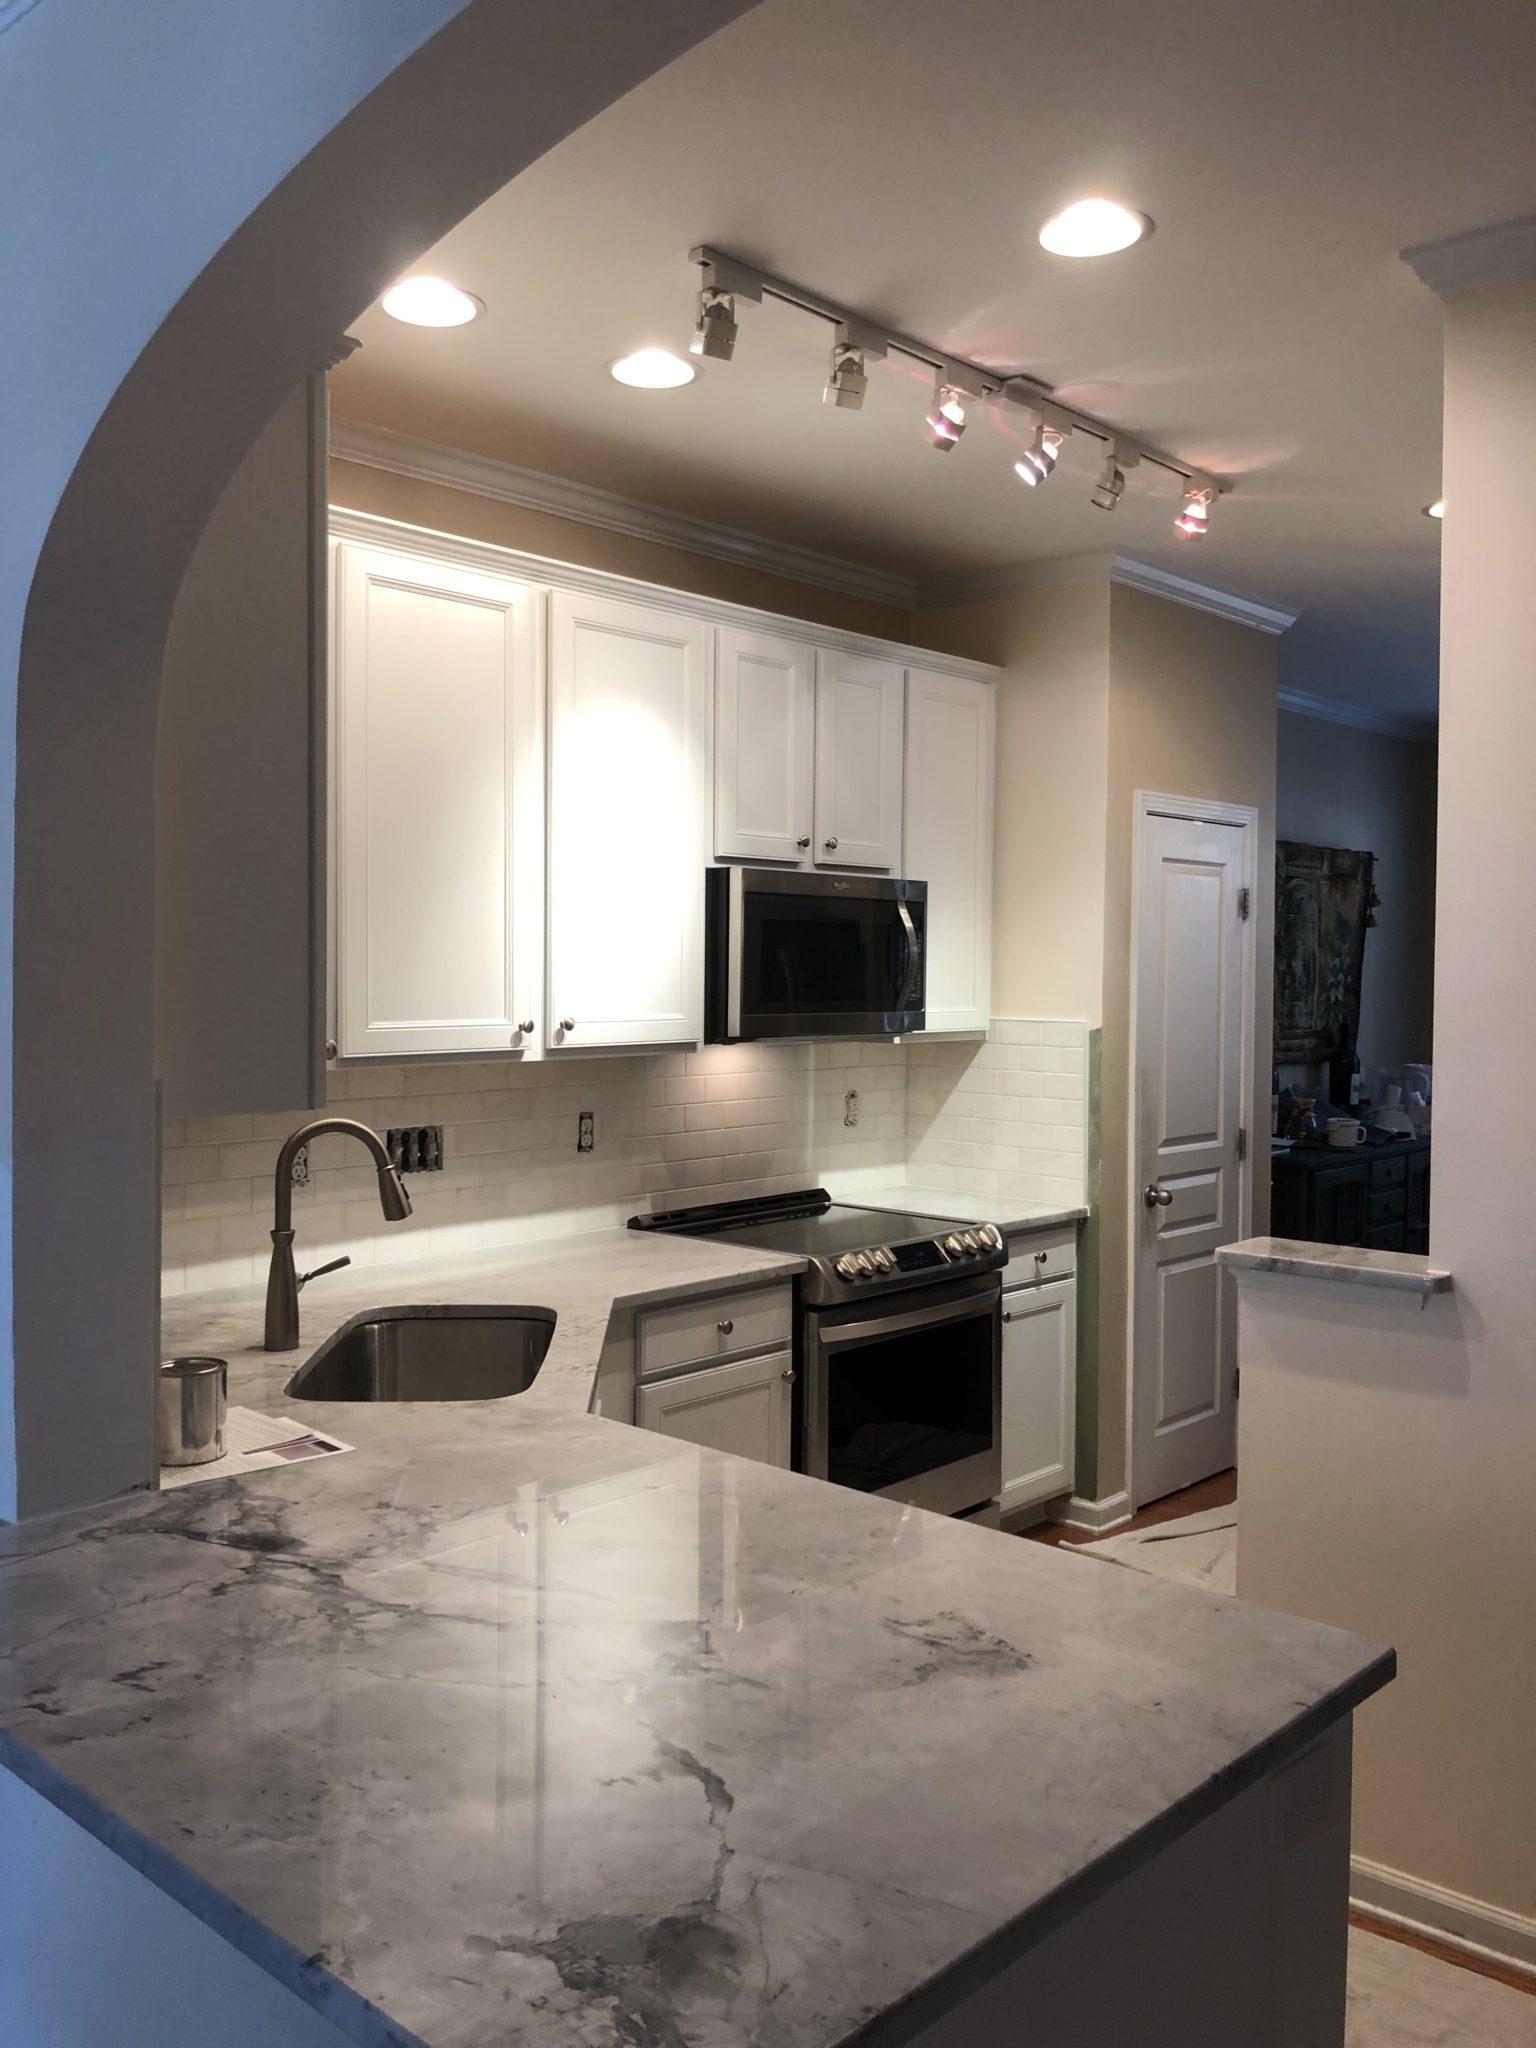 Ice Cube Kitchen 2 Cabinet Girls